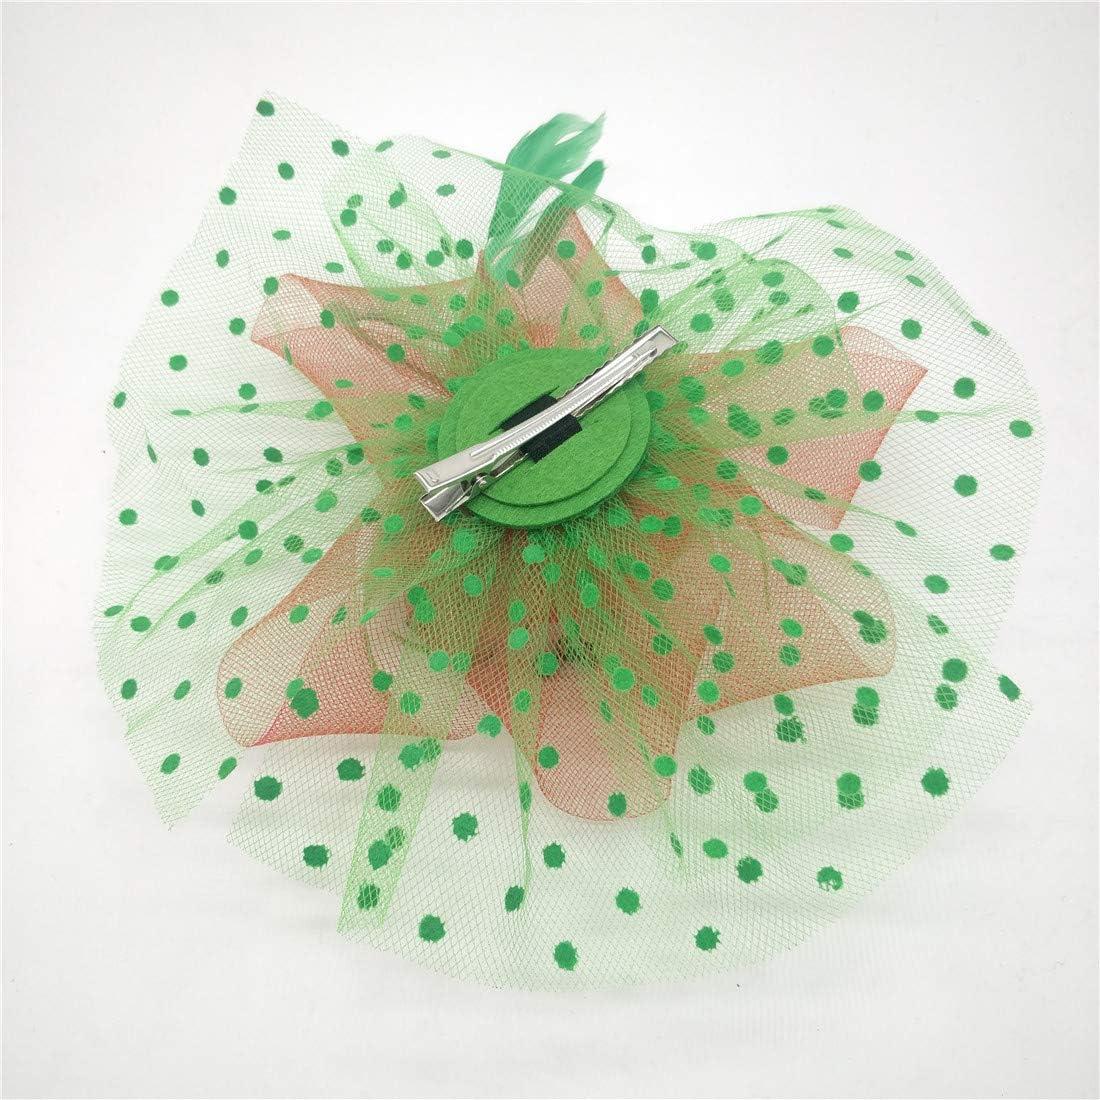 Ahugehome Fascinator Hair Clip Headband Pillbox Hat Flower Wedding Cocktail Tea Party